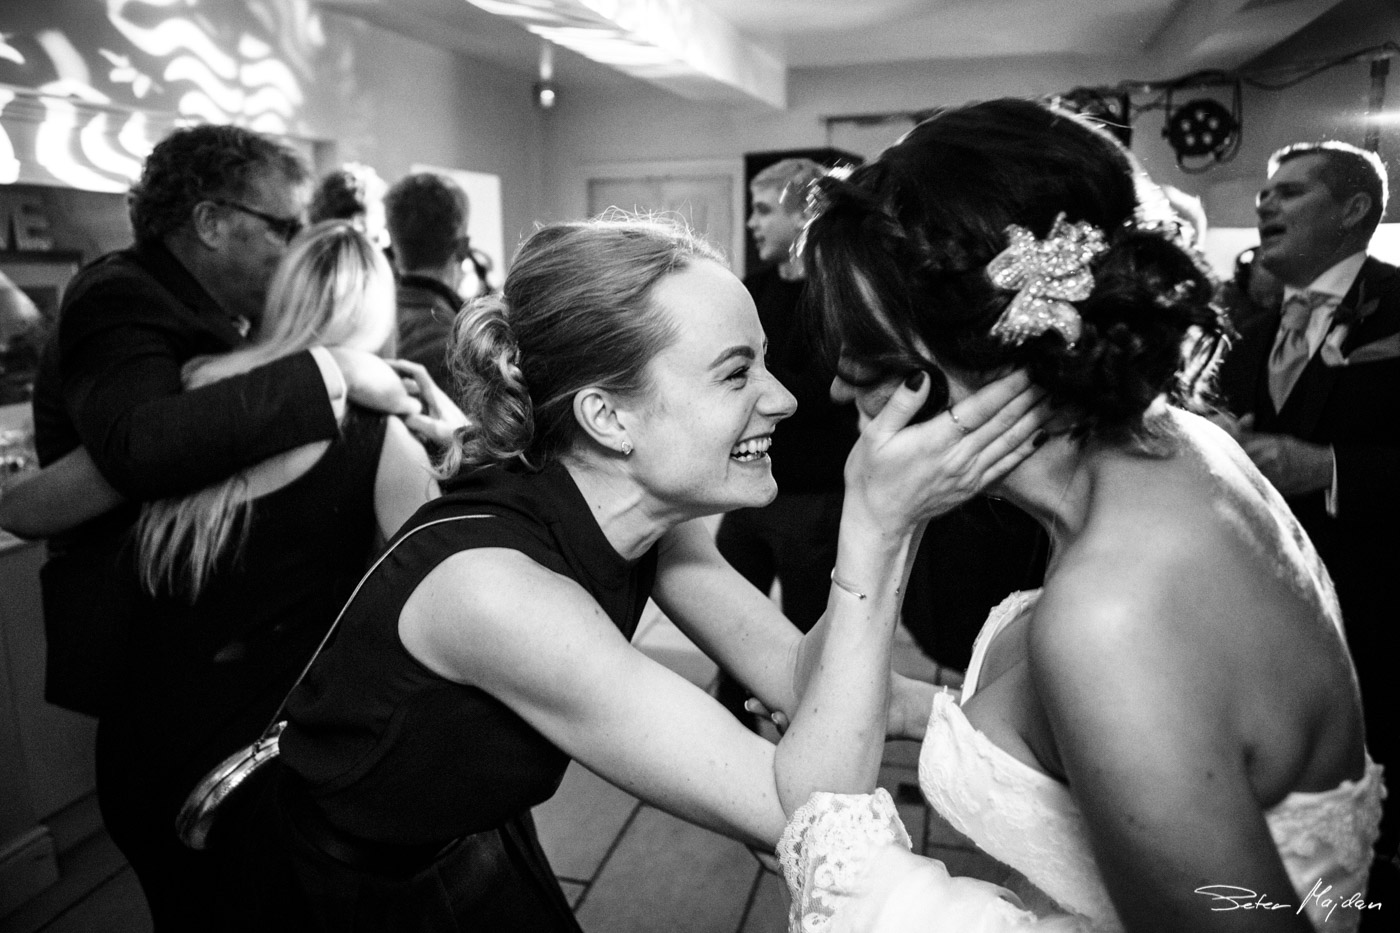 east-bridgford-hill-wedding-photography-67.jpg